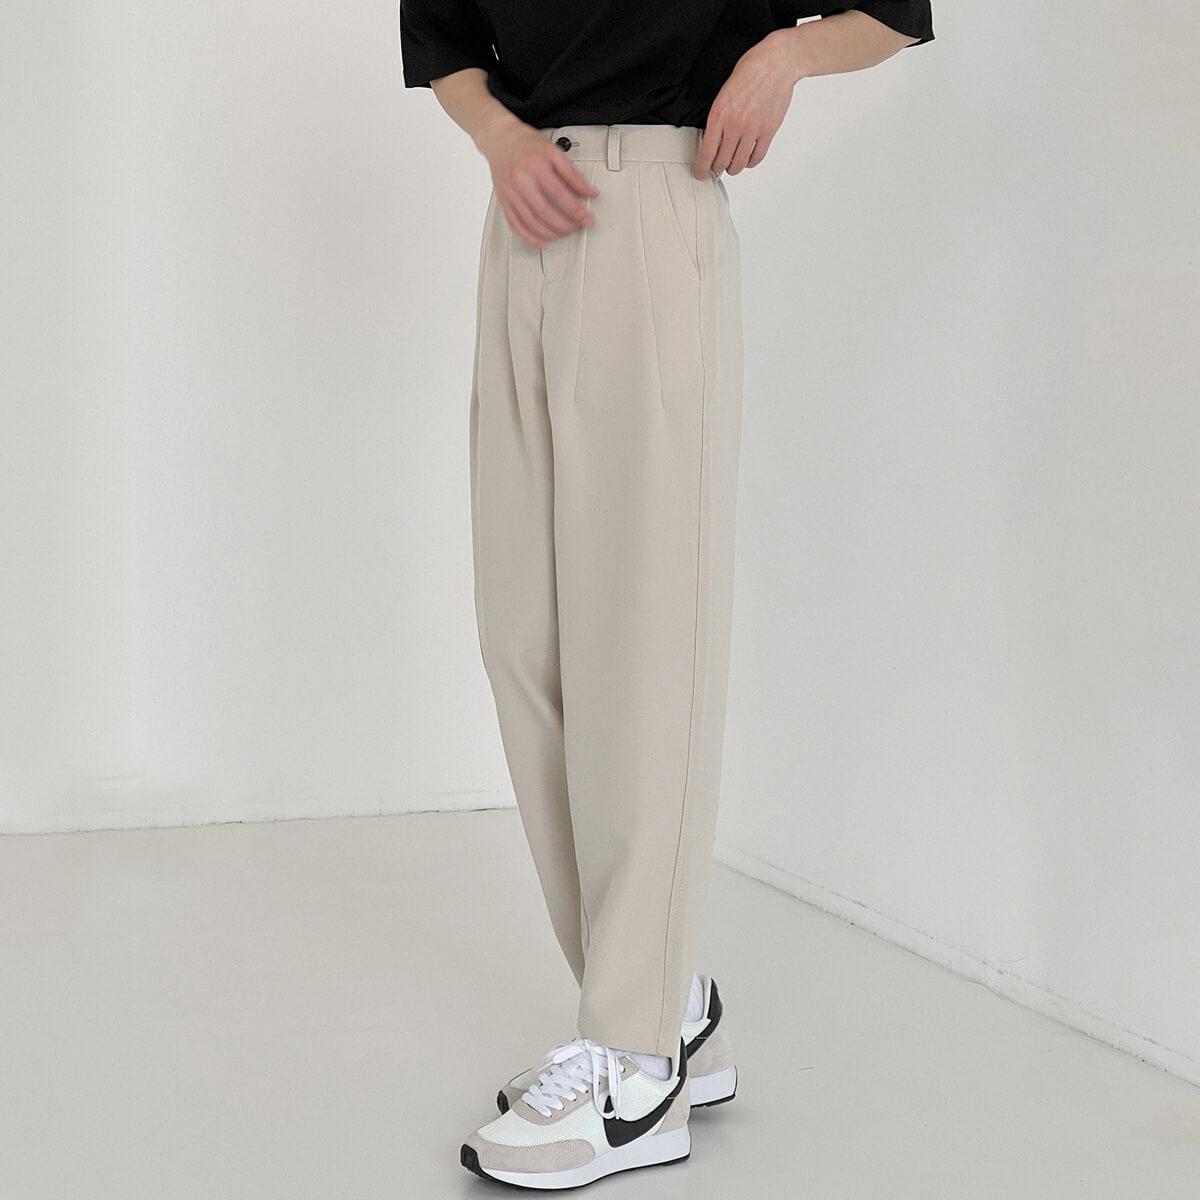 DAZO Studio Solid Color Minimalist Pants (2)